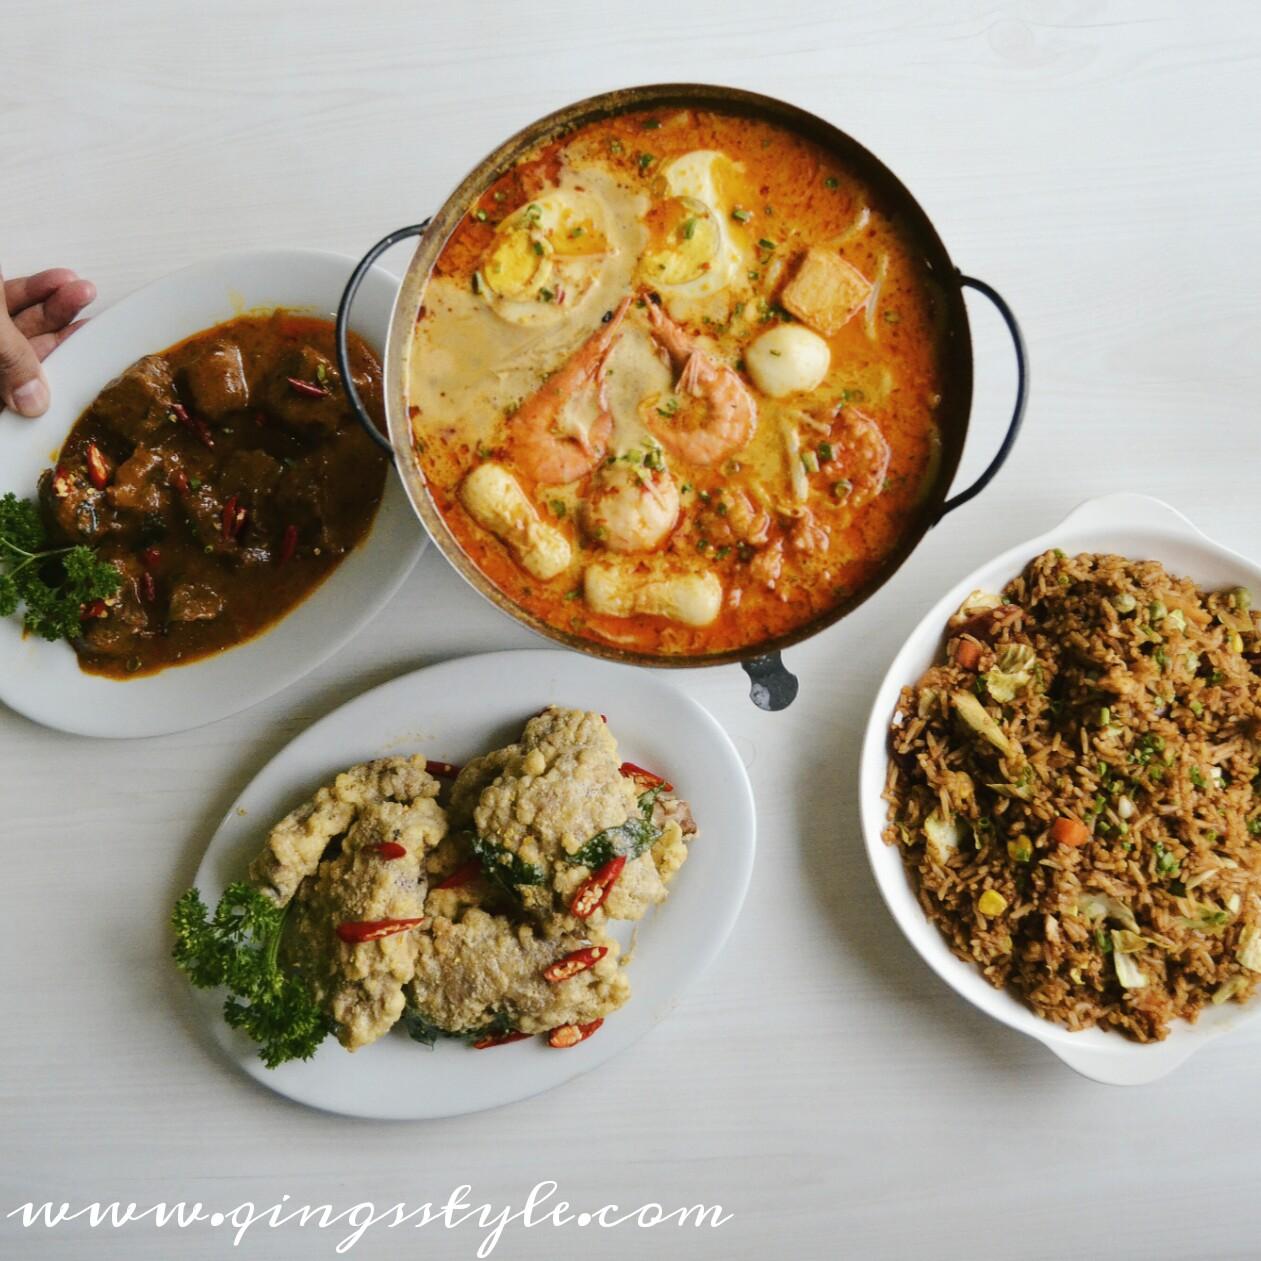 www.qingsstyle.com-bugis-singaporean-street-food